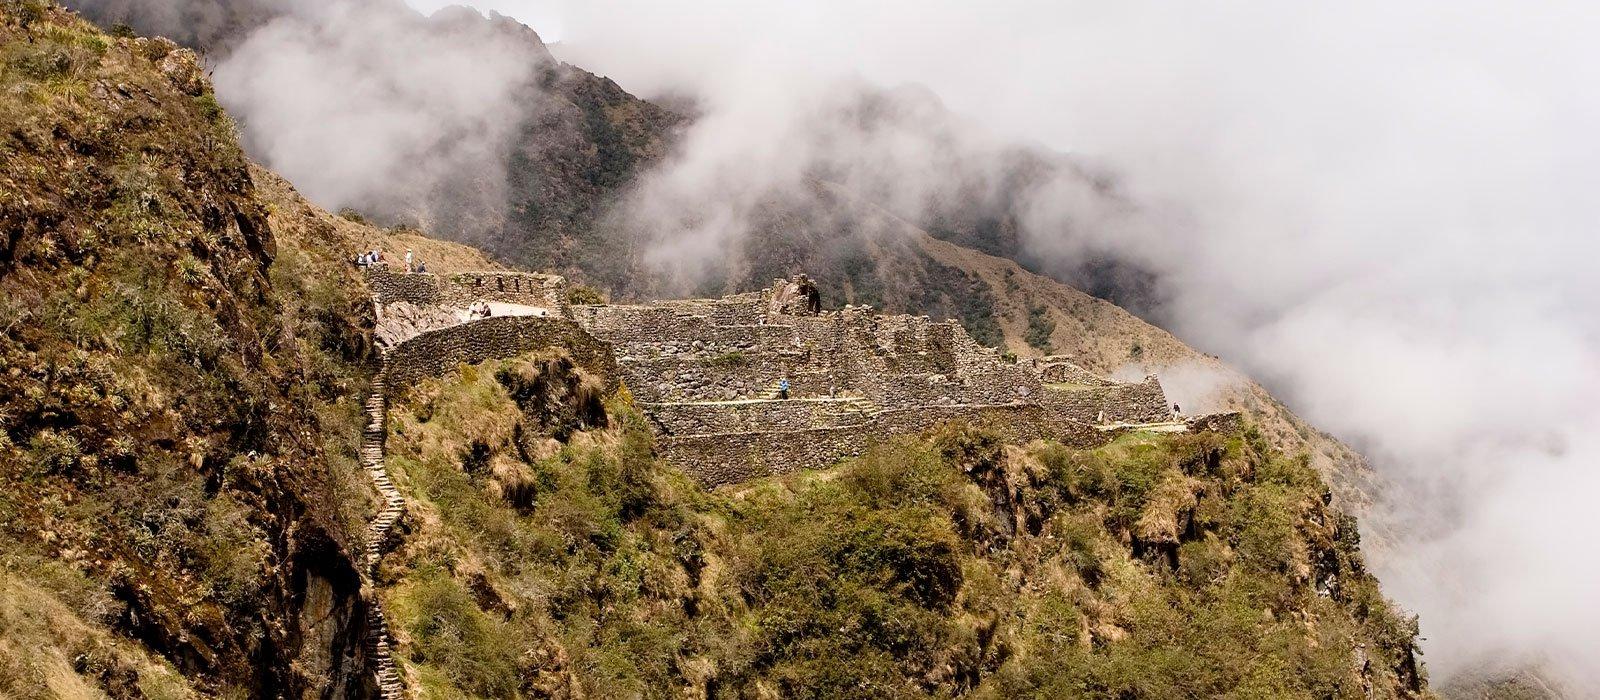 Trek along the Inca Trail & Machu Picchu